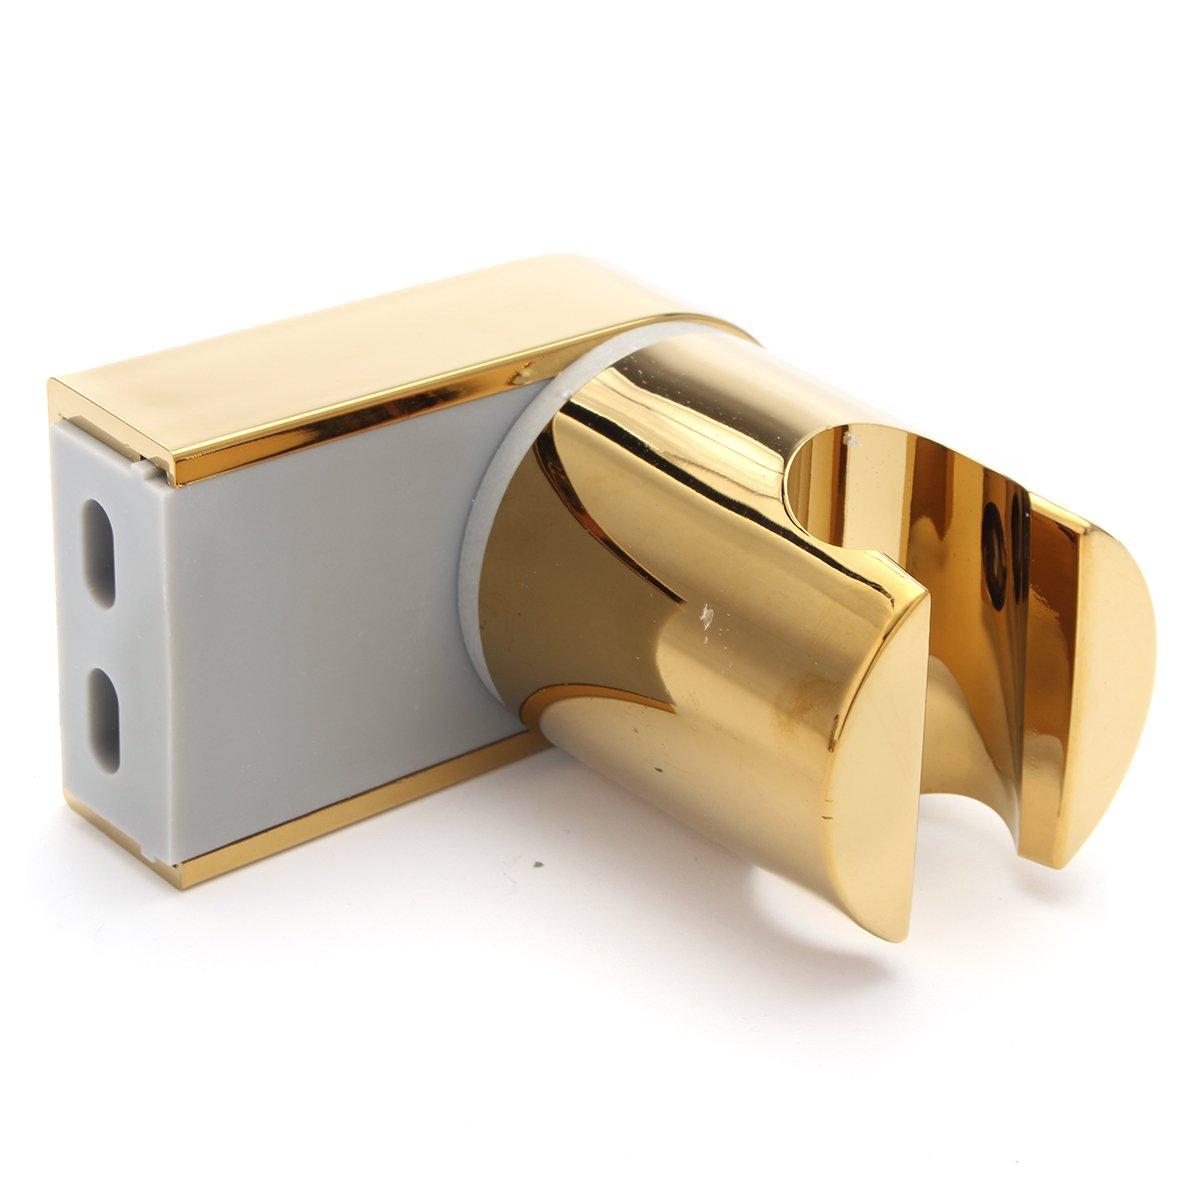 Shower Head Set with 1.5m Shower Hose & Bracket Holder Chrome Universal Gold Baogu